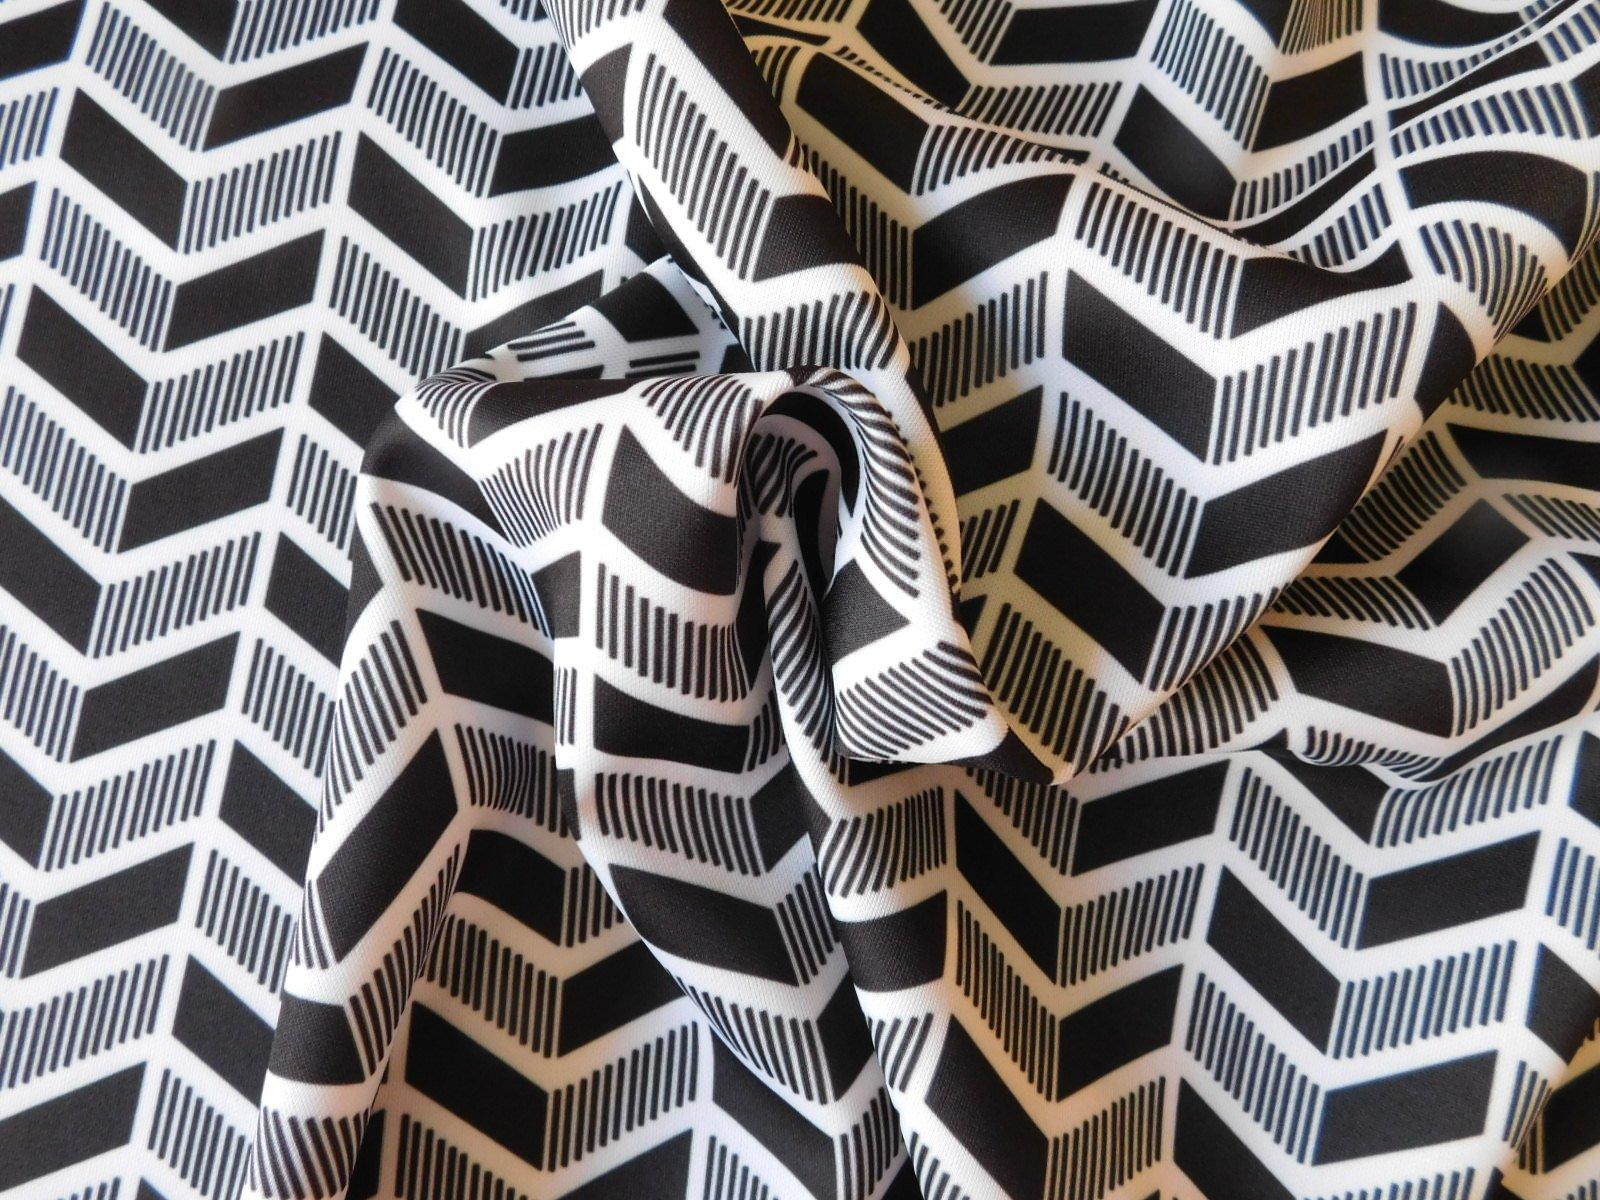 Smak Parlor Black and White Chevron Scuba Knit